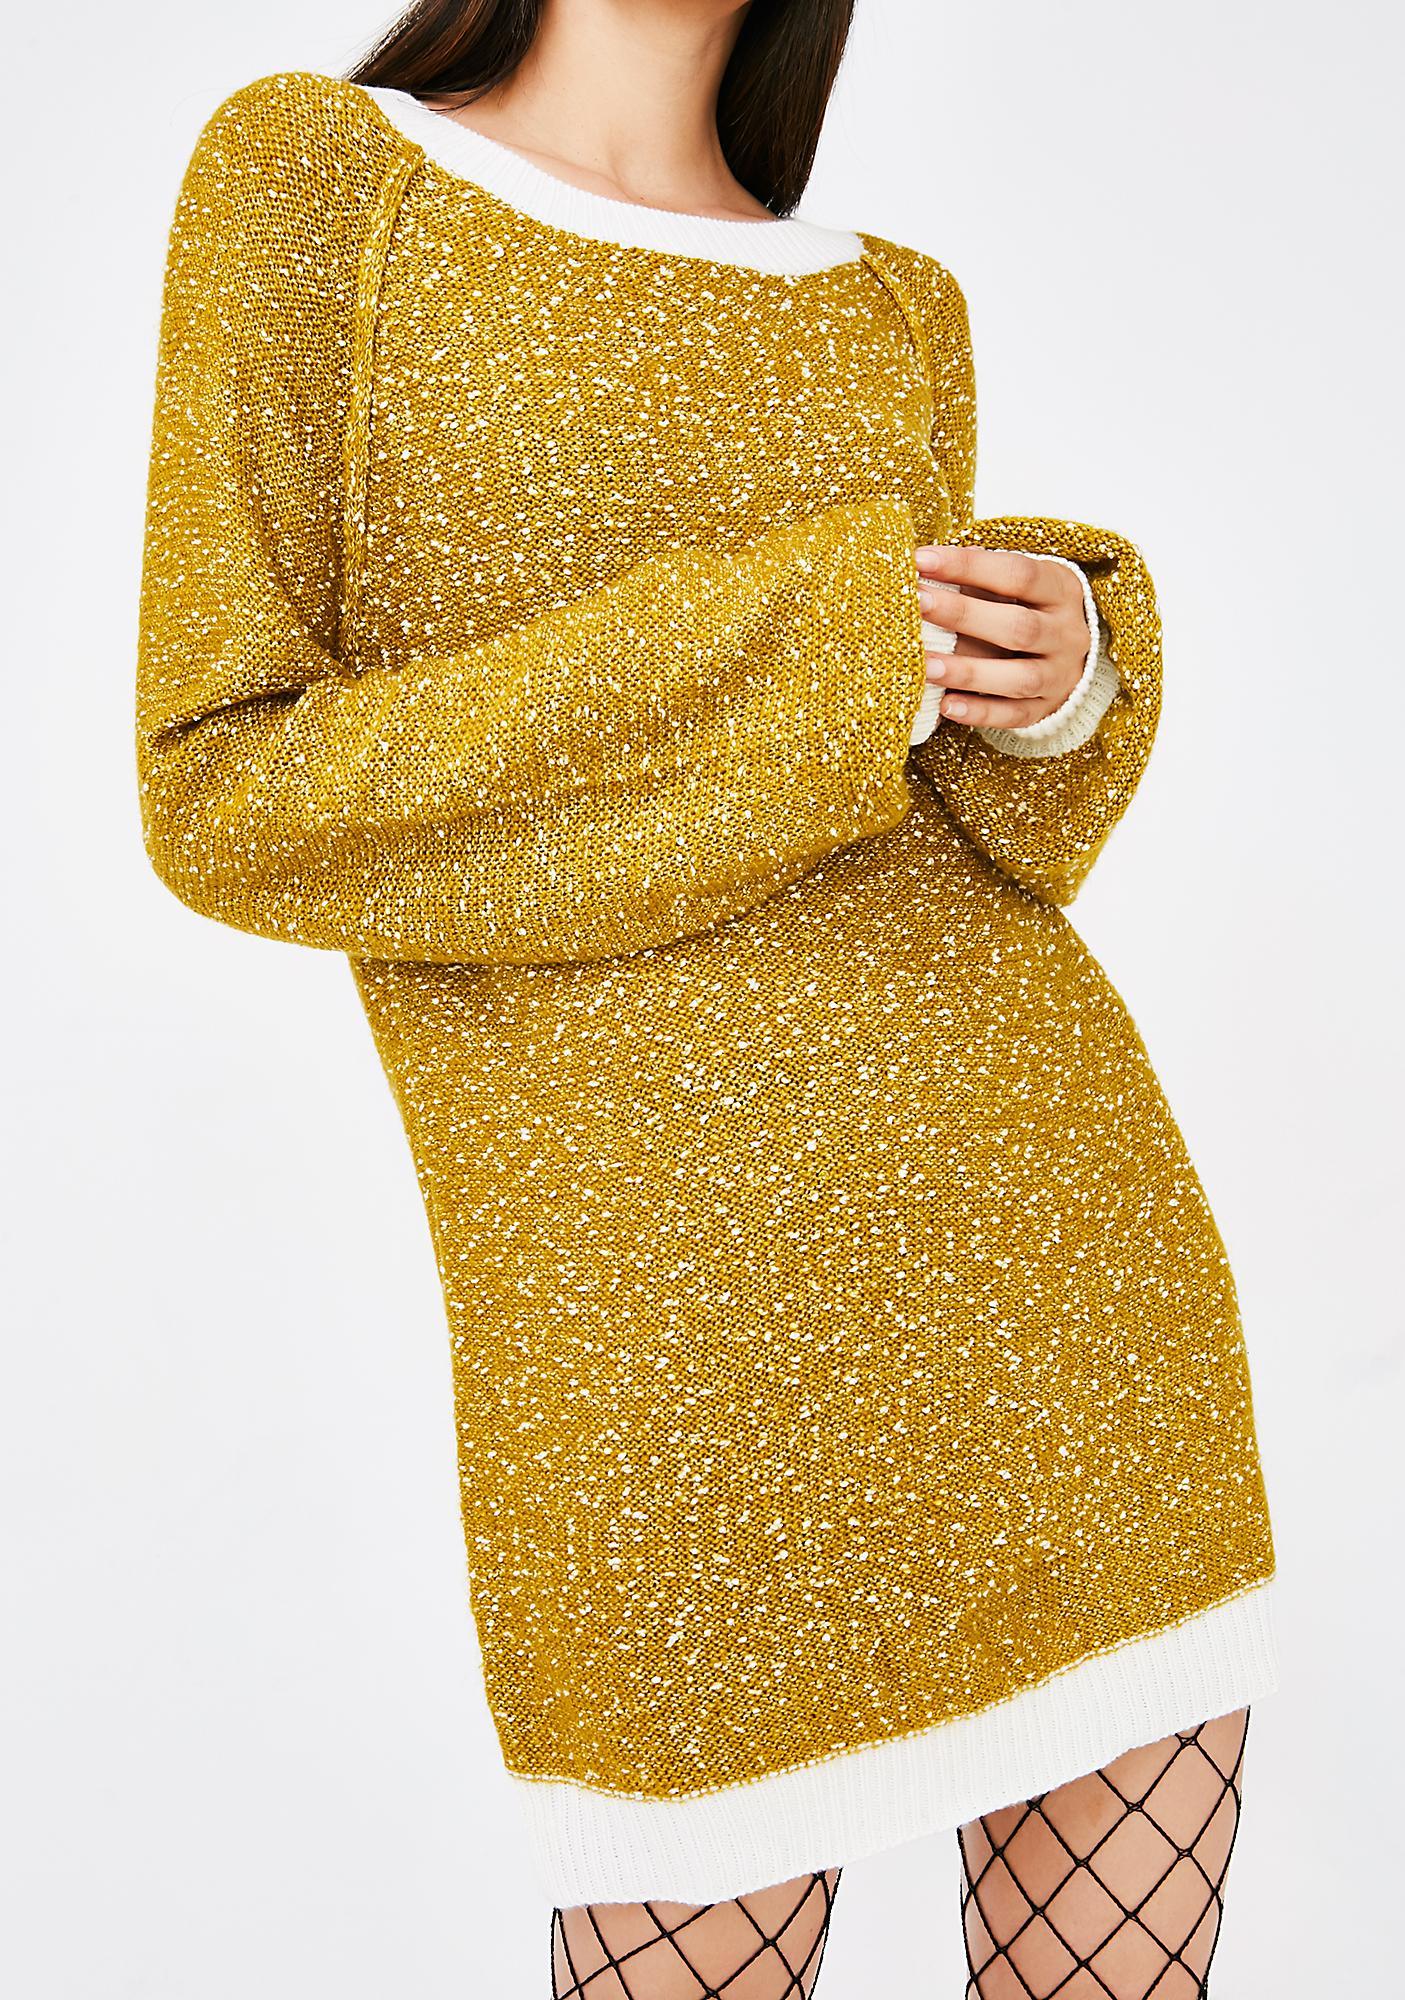 Honey Trap Sweater Dress